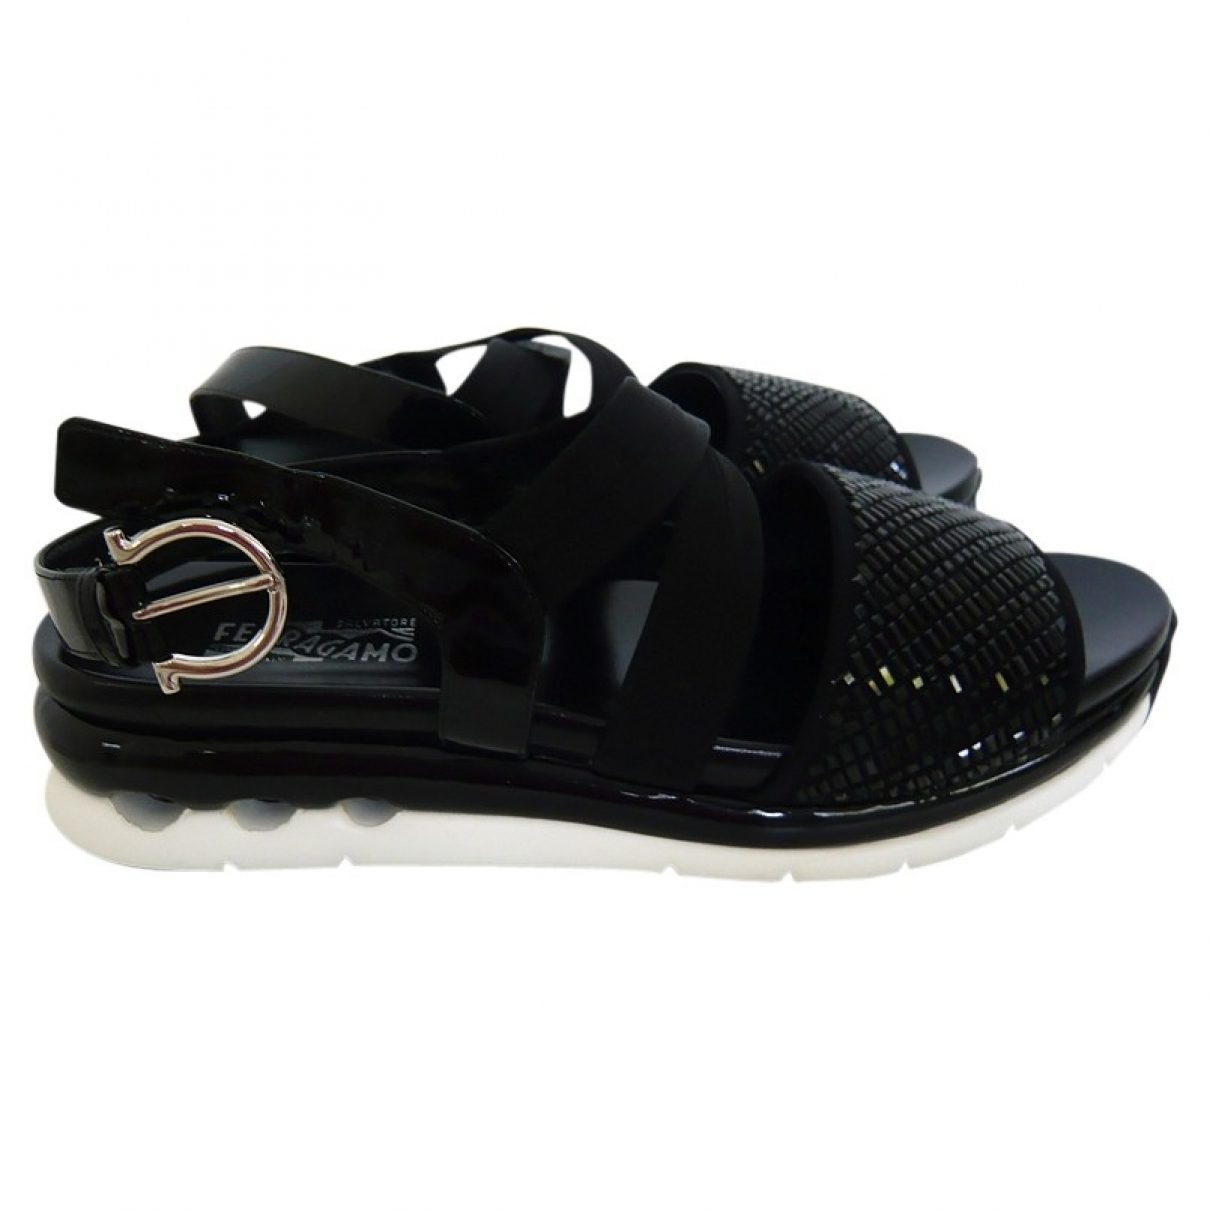 Salvatore Ferragamo \N Black Leather Sandals for Women 39 EU